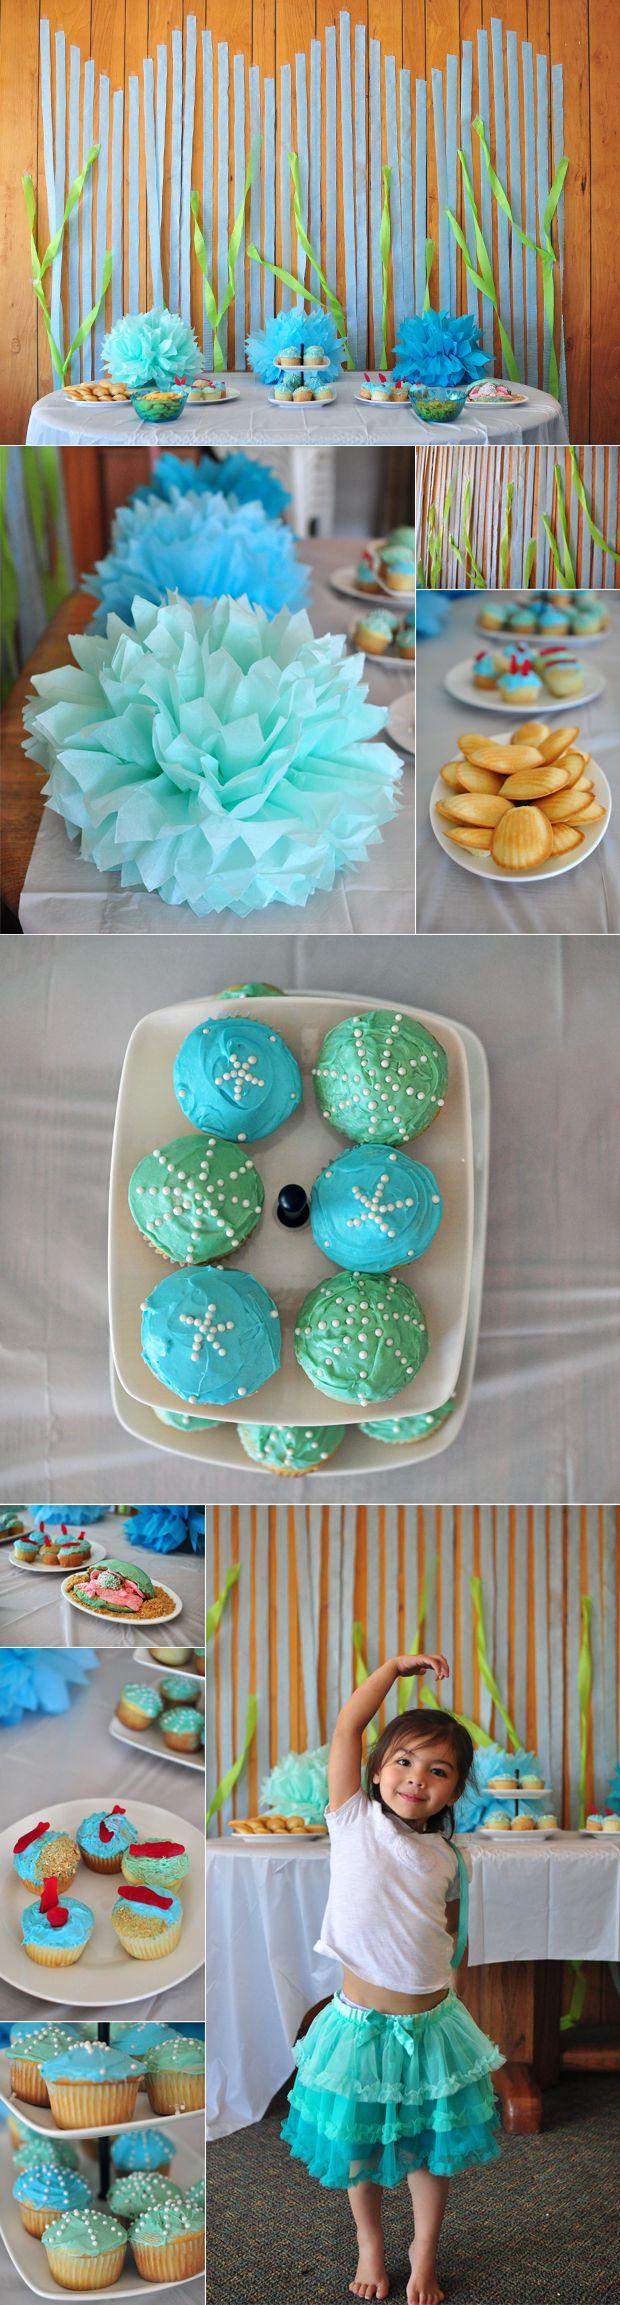 ocean-themed birthday dessert table by Donaville Herrick / featured on dearestnature.com